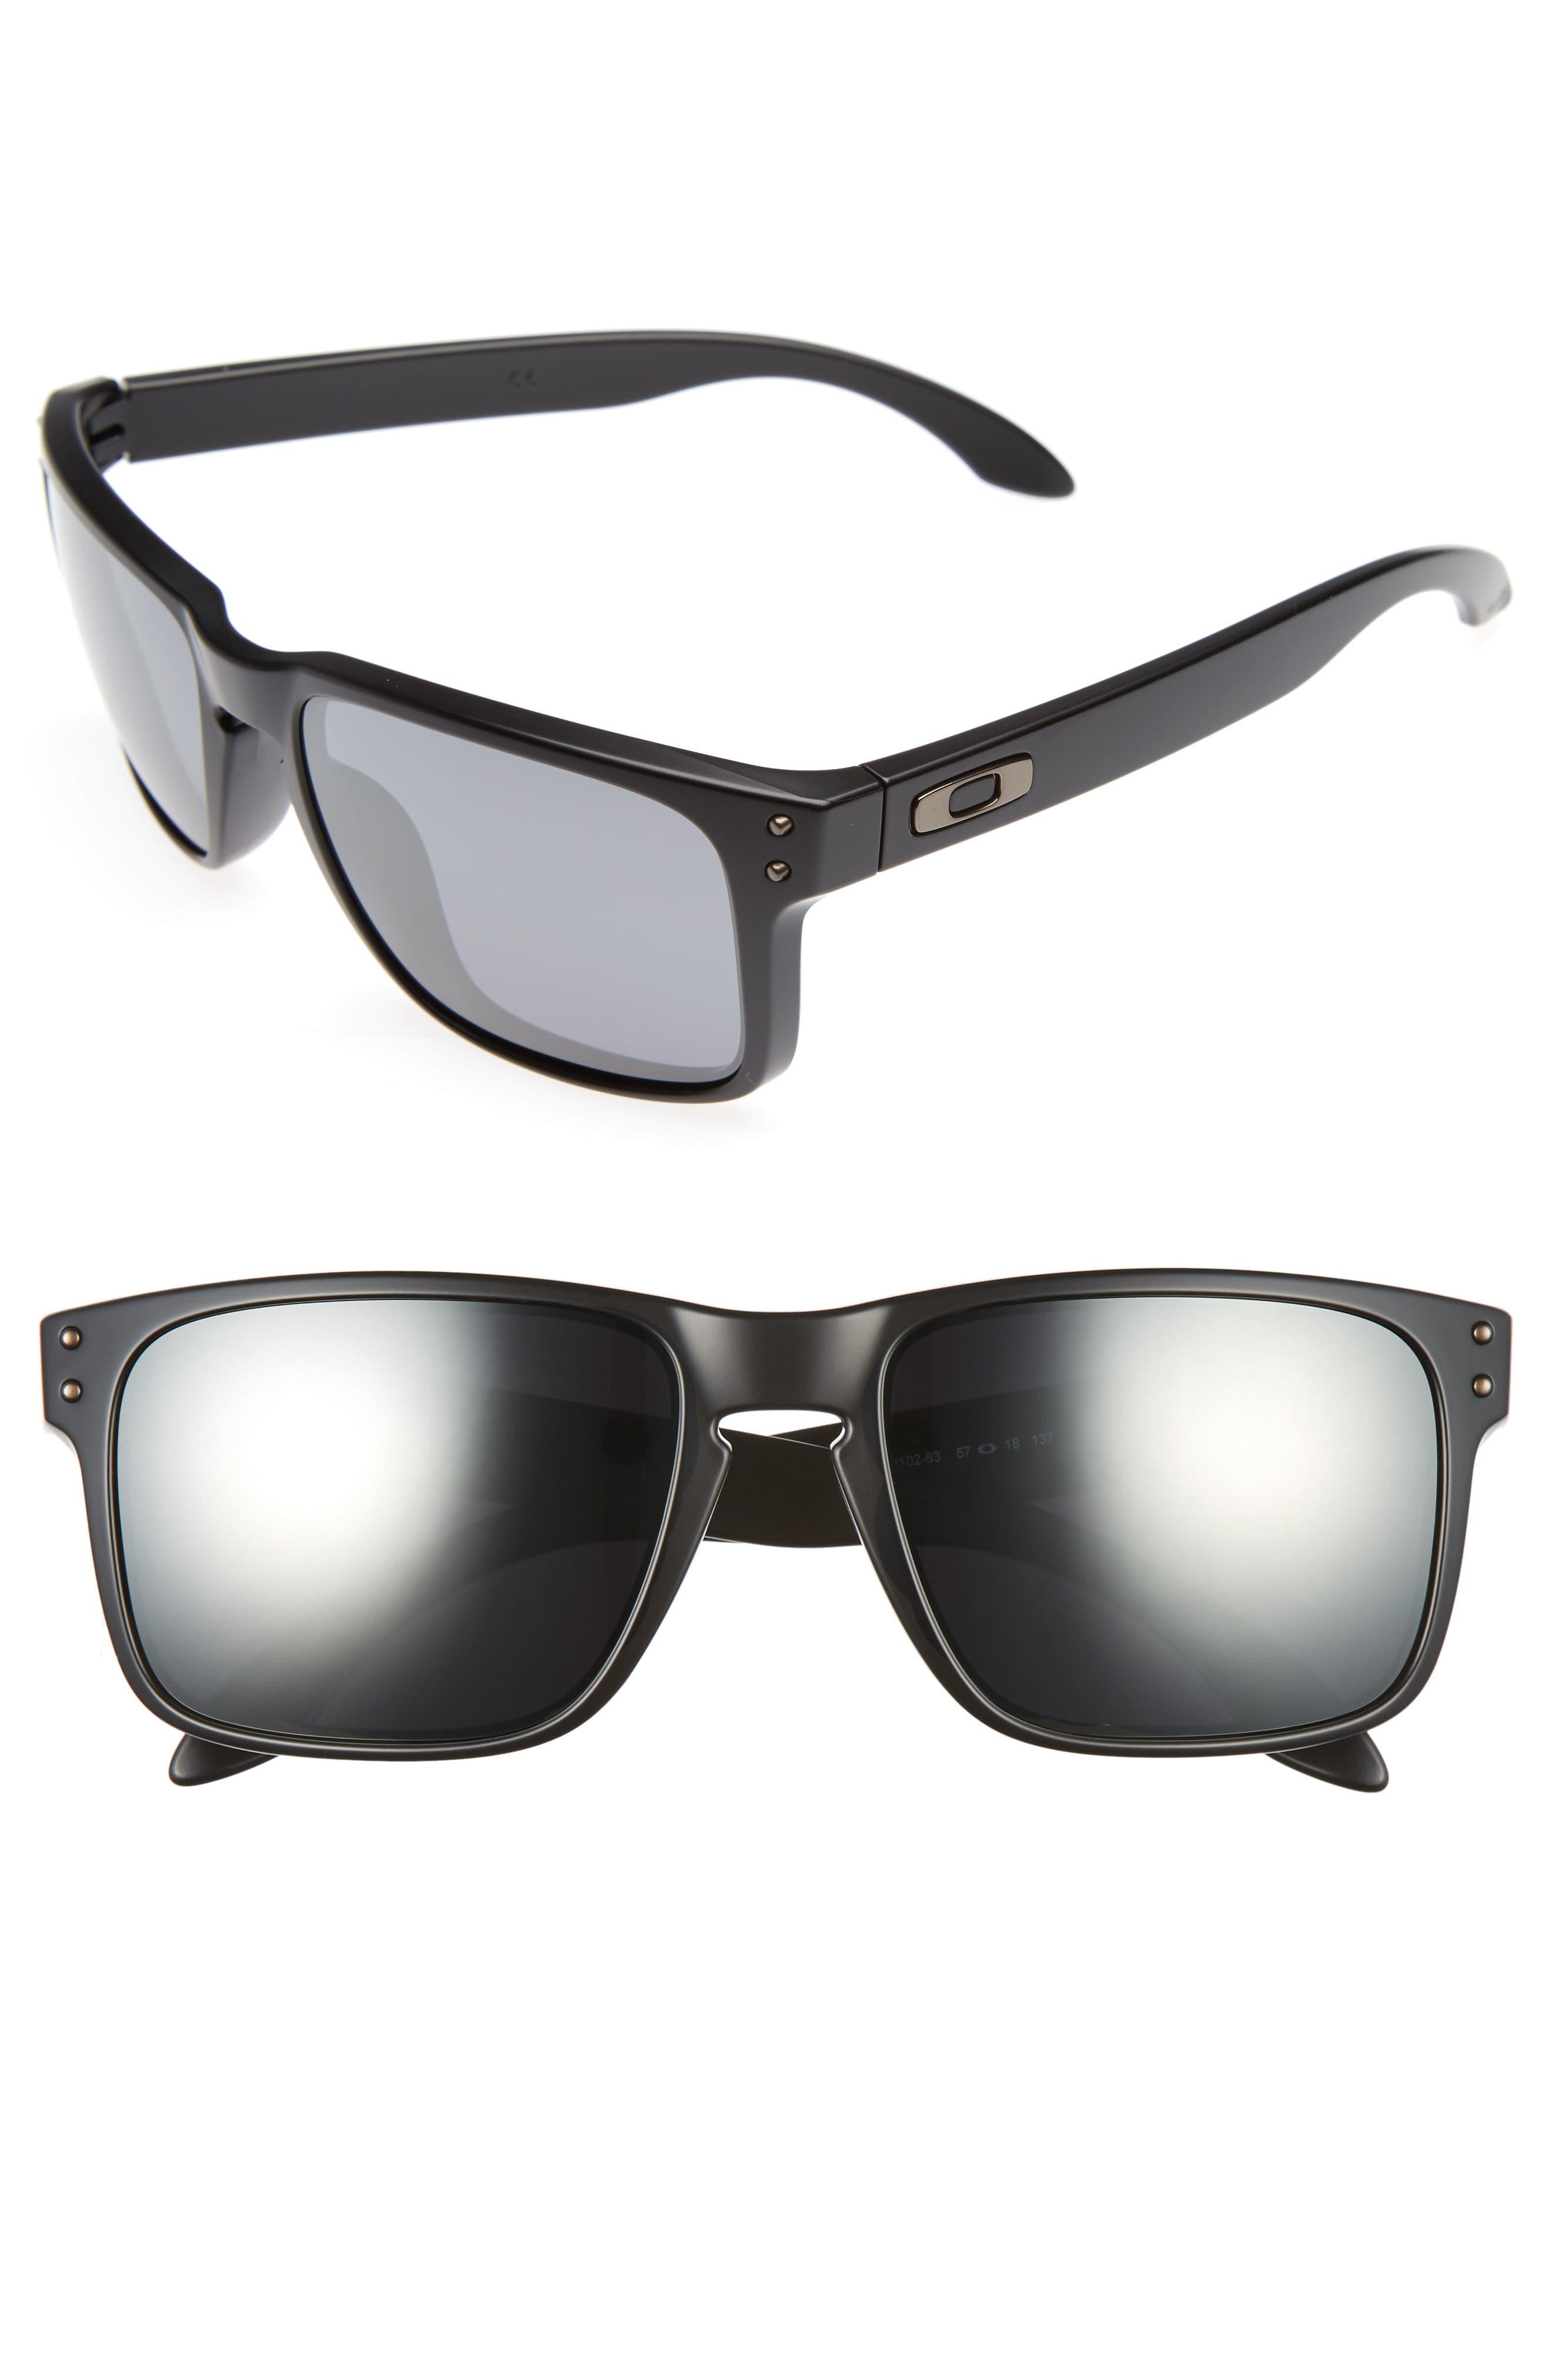 Main Image - Oakley Holbrook 57mm Sunglasses